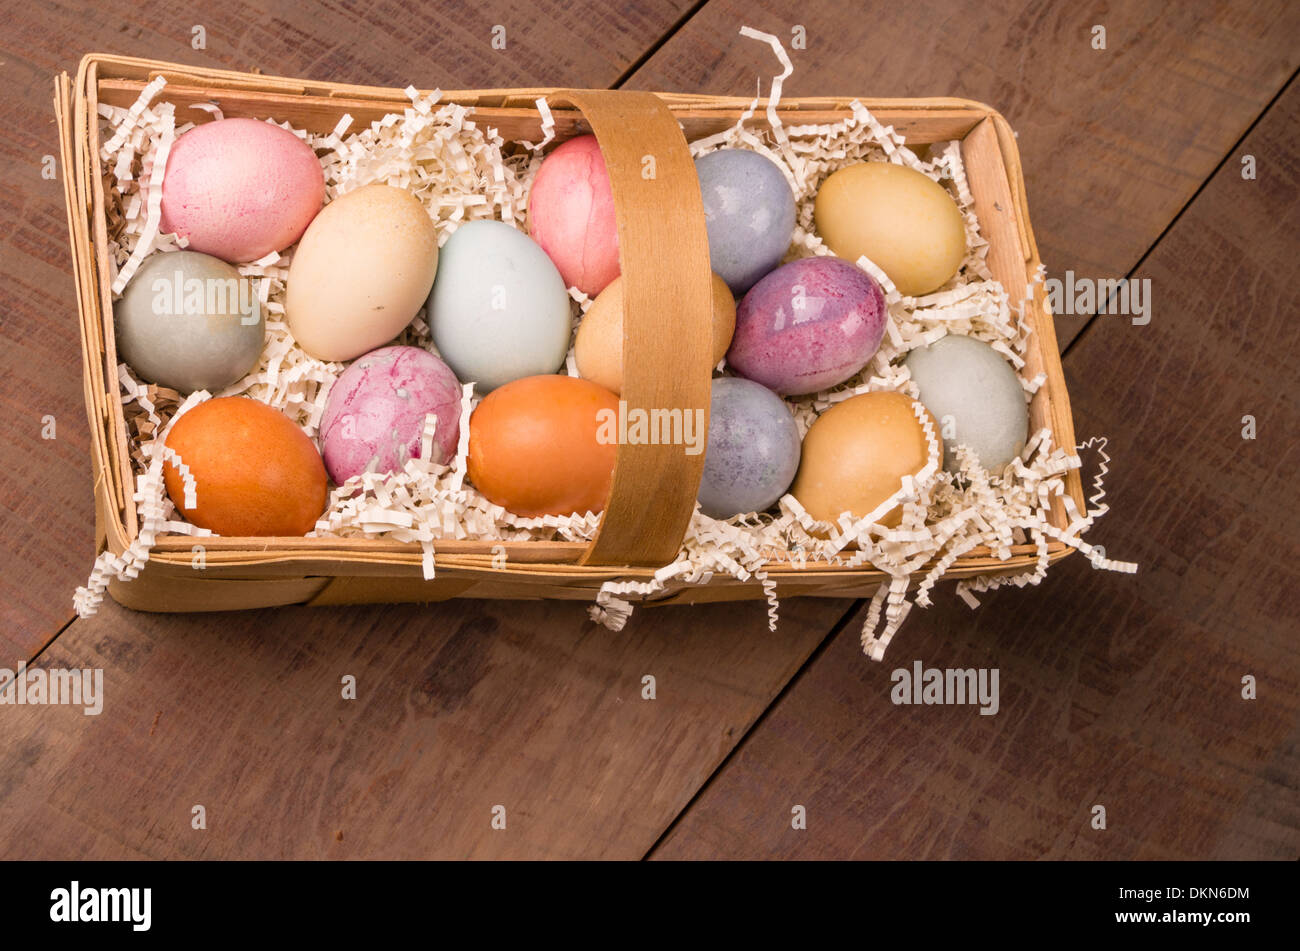 Dyes Color Stockfotos & Dyes Color Bilder - Seite 3 - Alamy